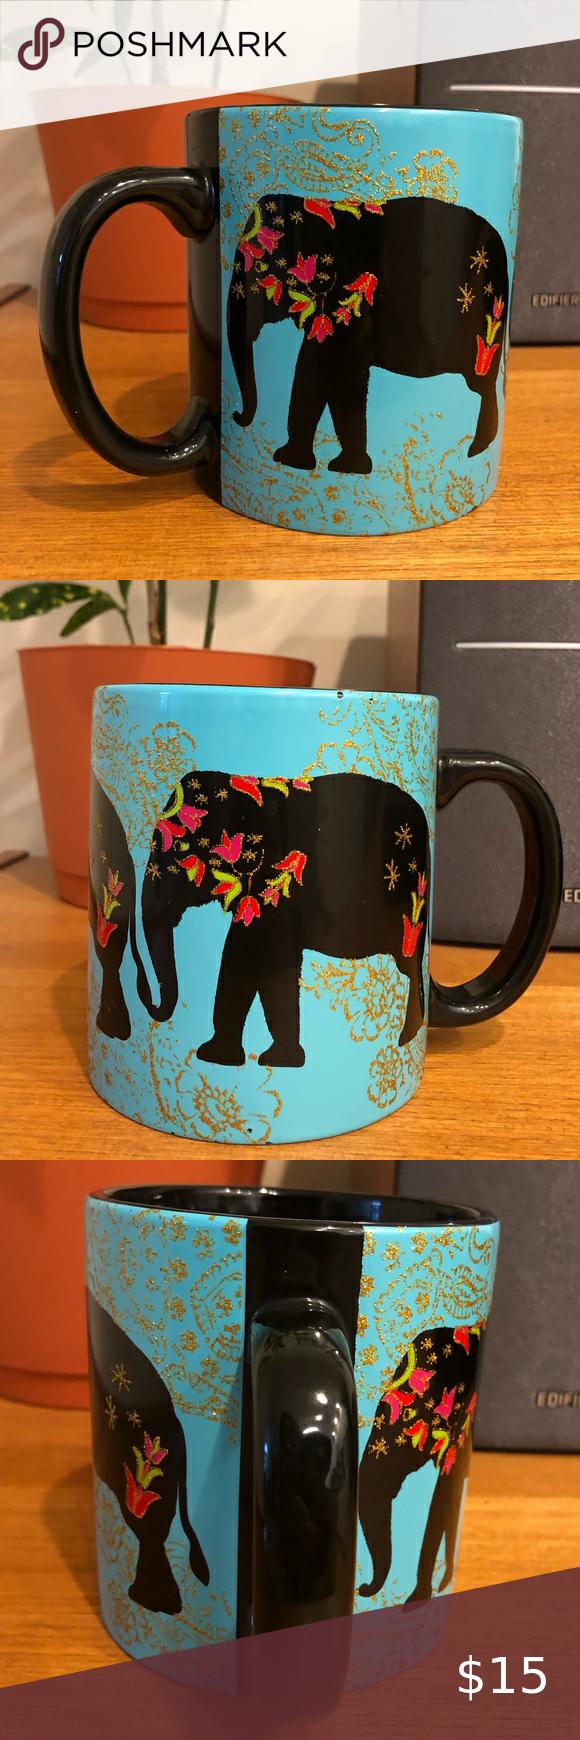 Boho Indian Elephant Coffee Mug in 2020 Painted indian